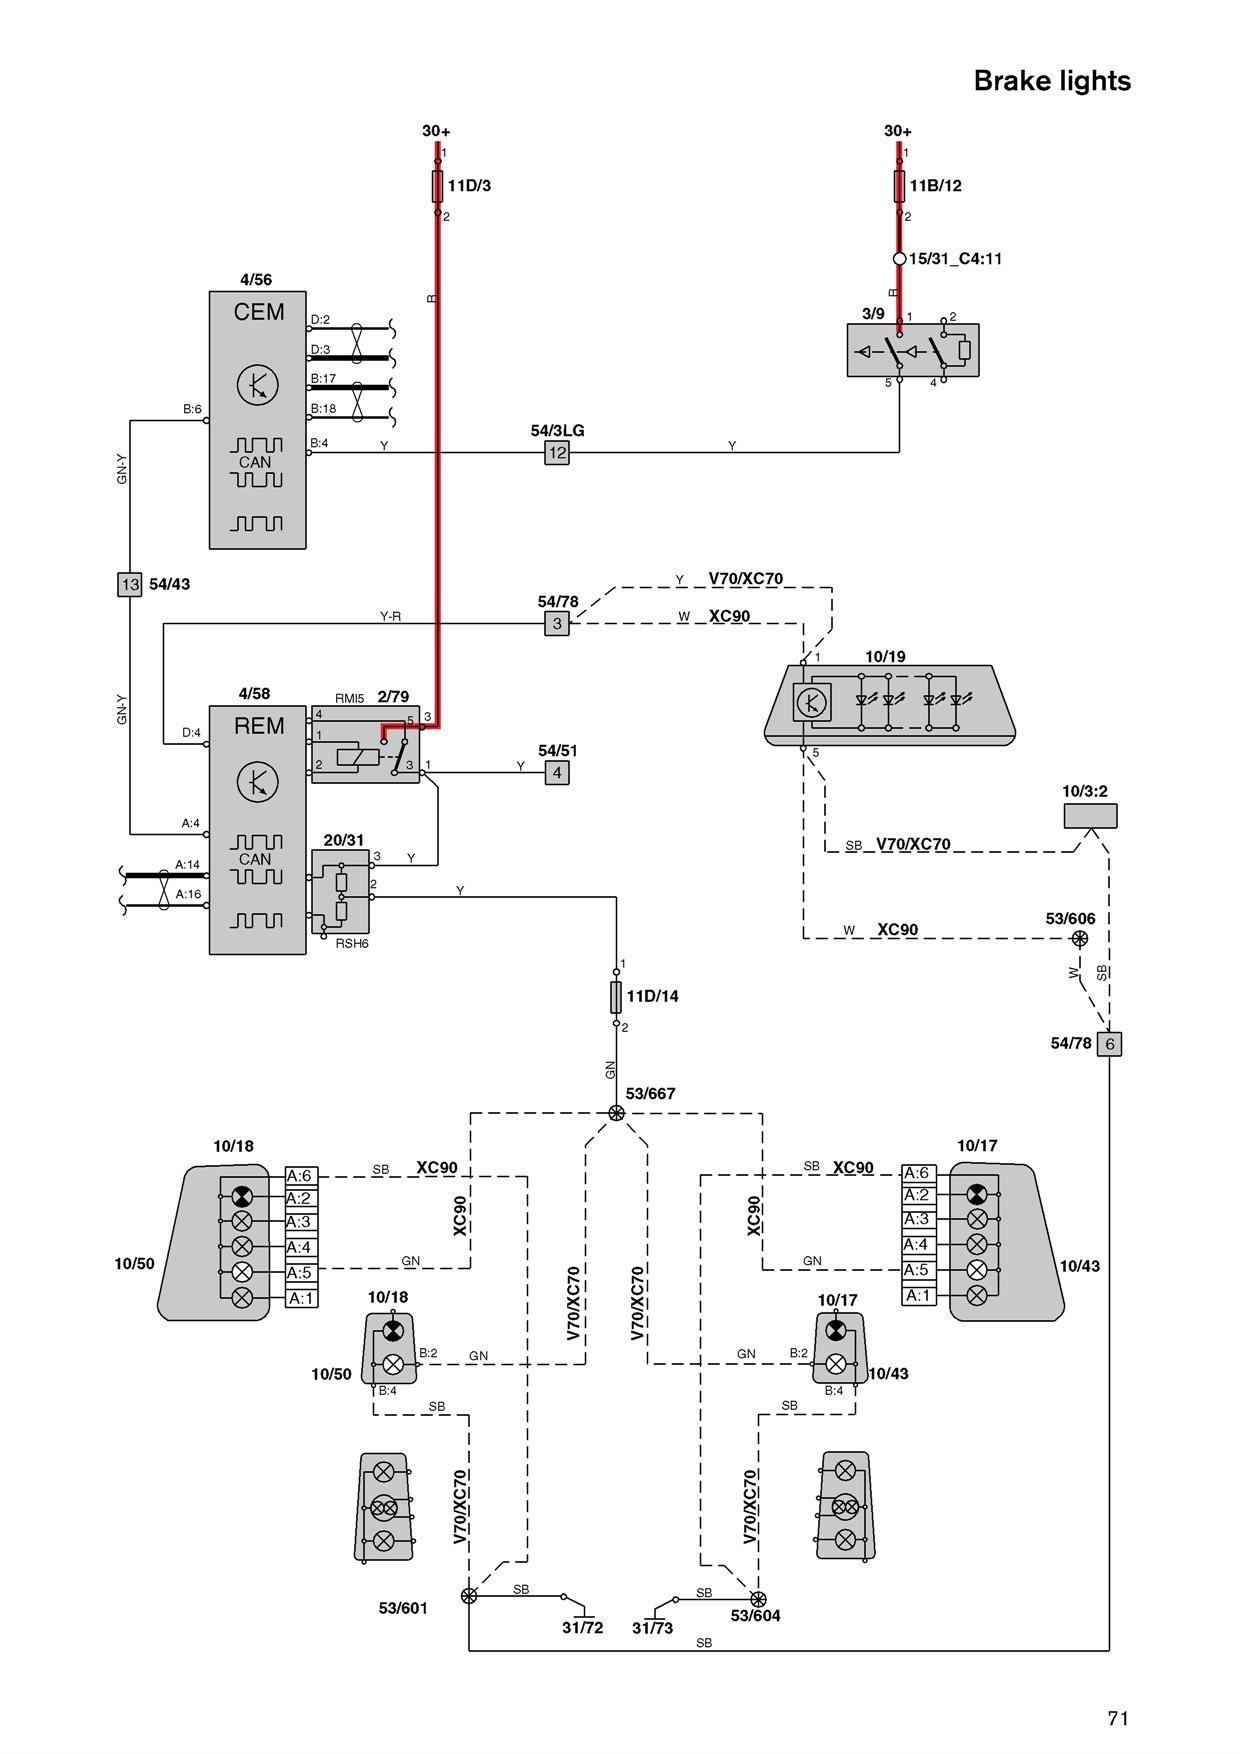 1996 Volvo 850 Stereo Wiring Diagram : Volvo radio wiring diagram